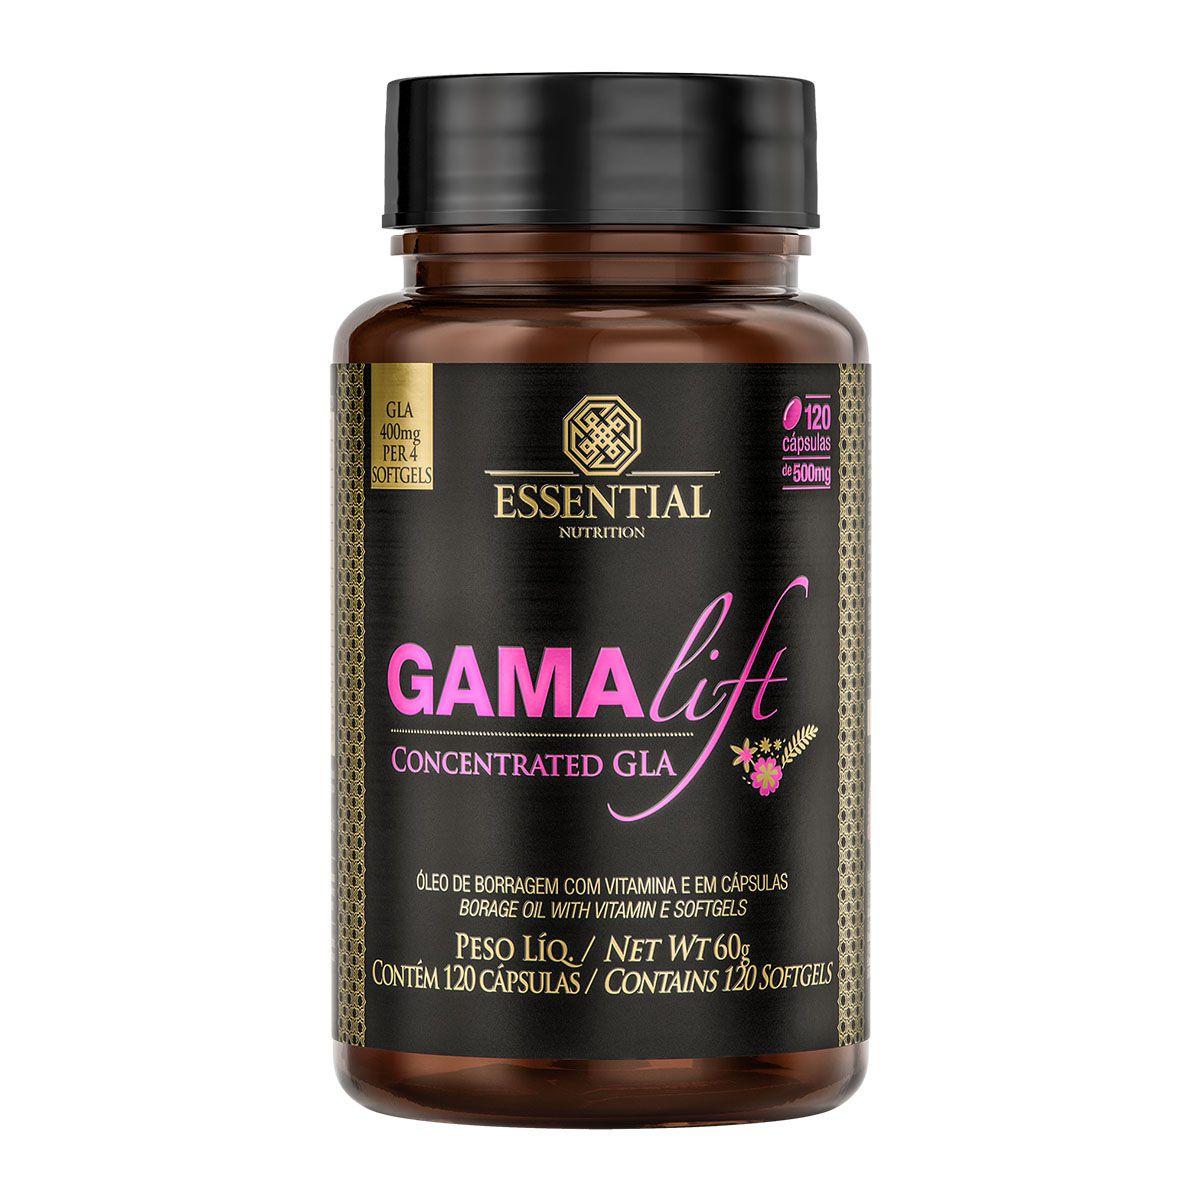 Gama Lift 120 Softgels - Essential Nutrition